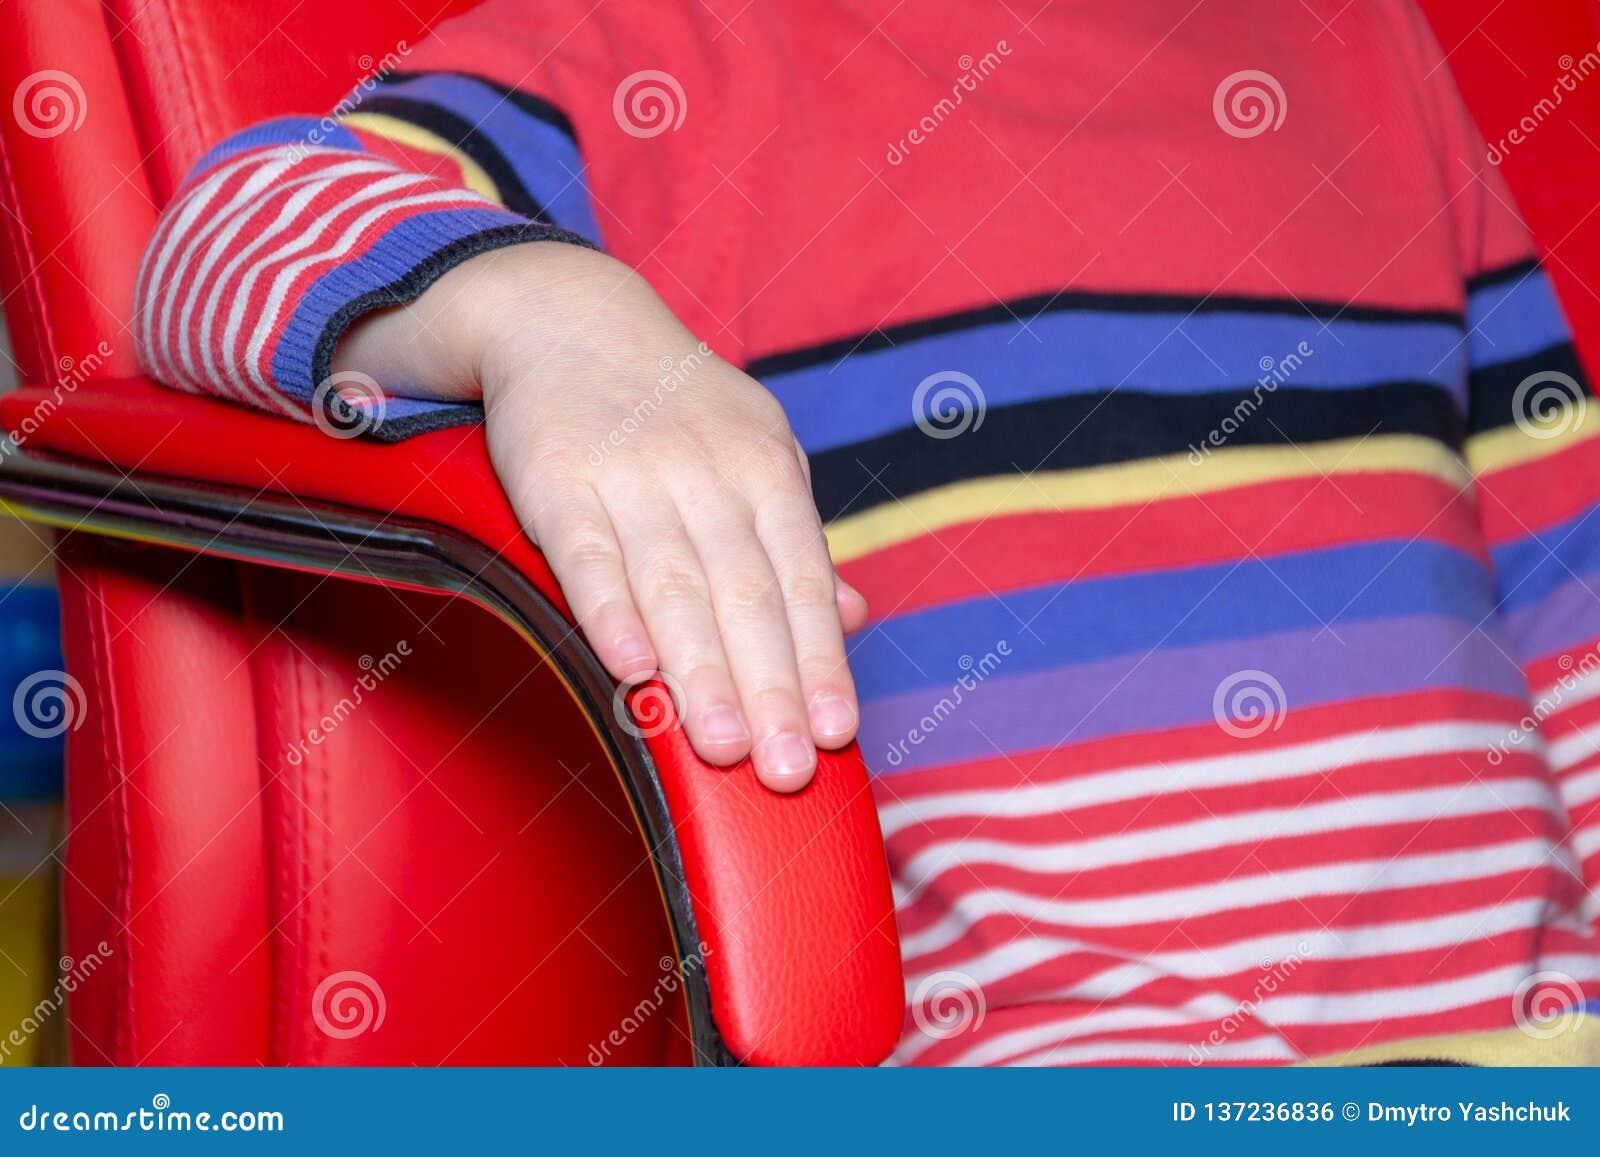 Color armchair, Modern designer chair on Texture chair